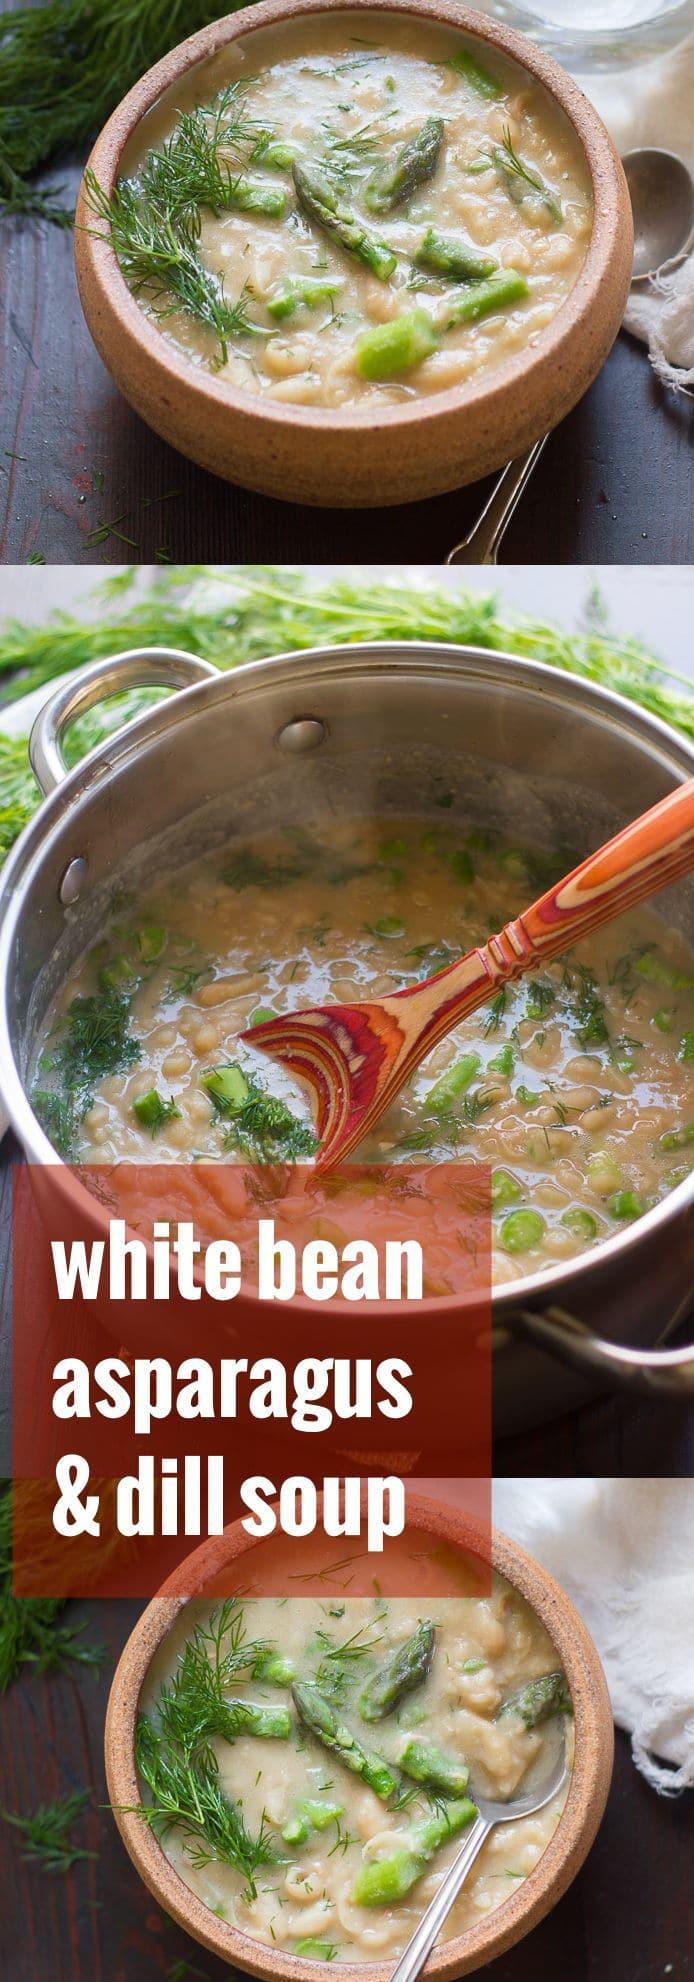 Creamy White Bean Asparagus & Dill Soup